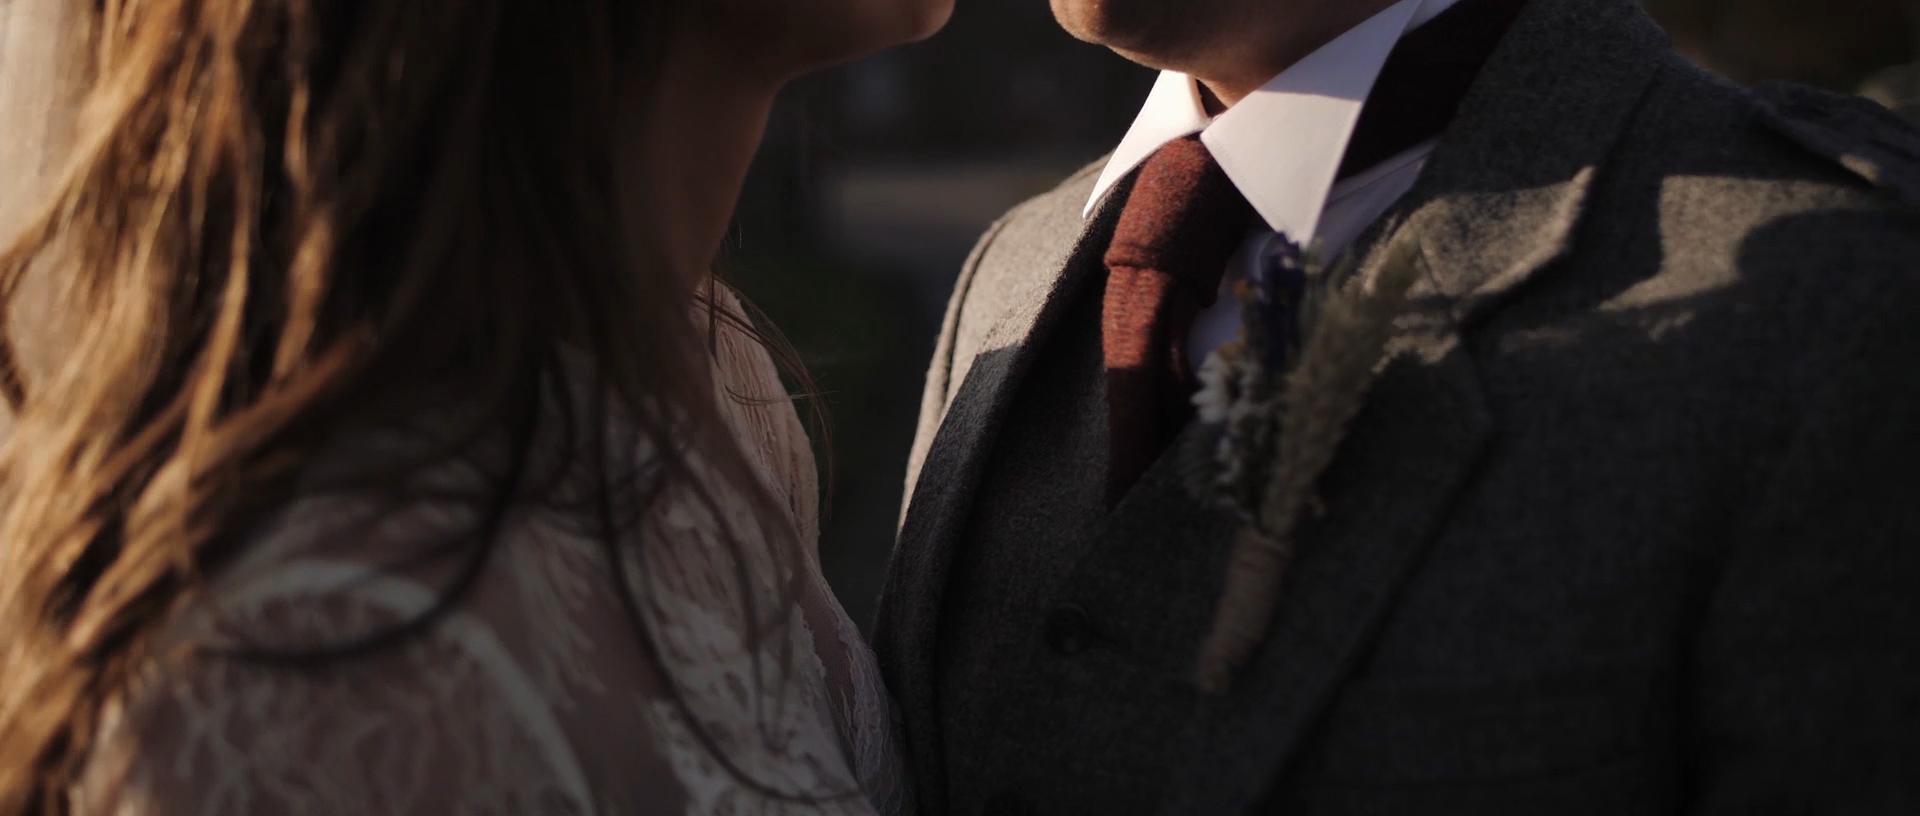 duns-castle-wedding-videographer_LL_04.jpg